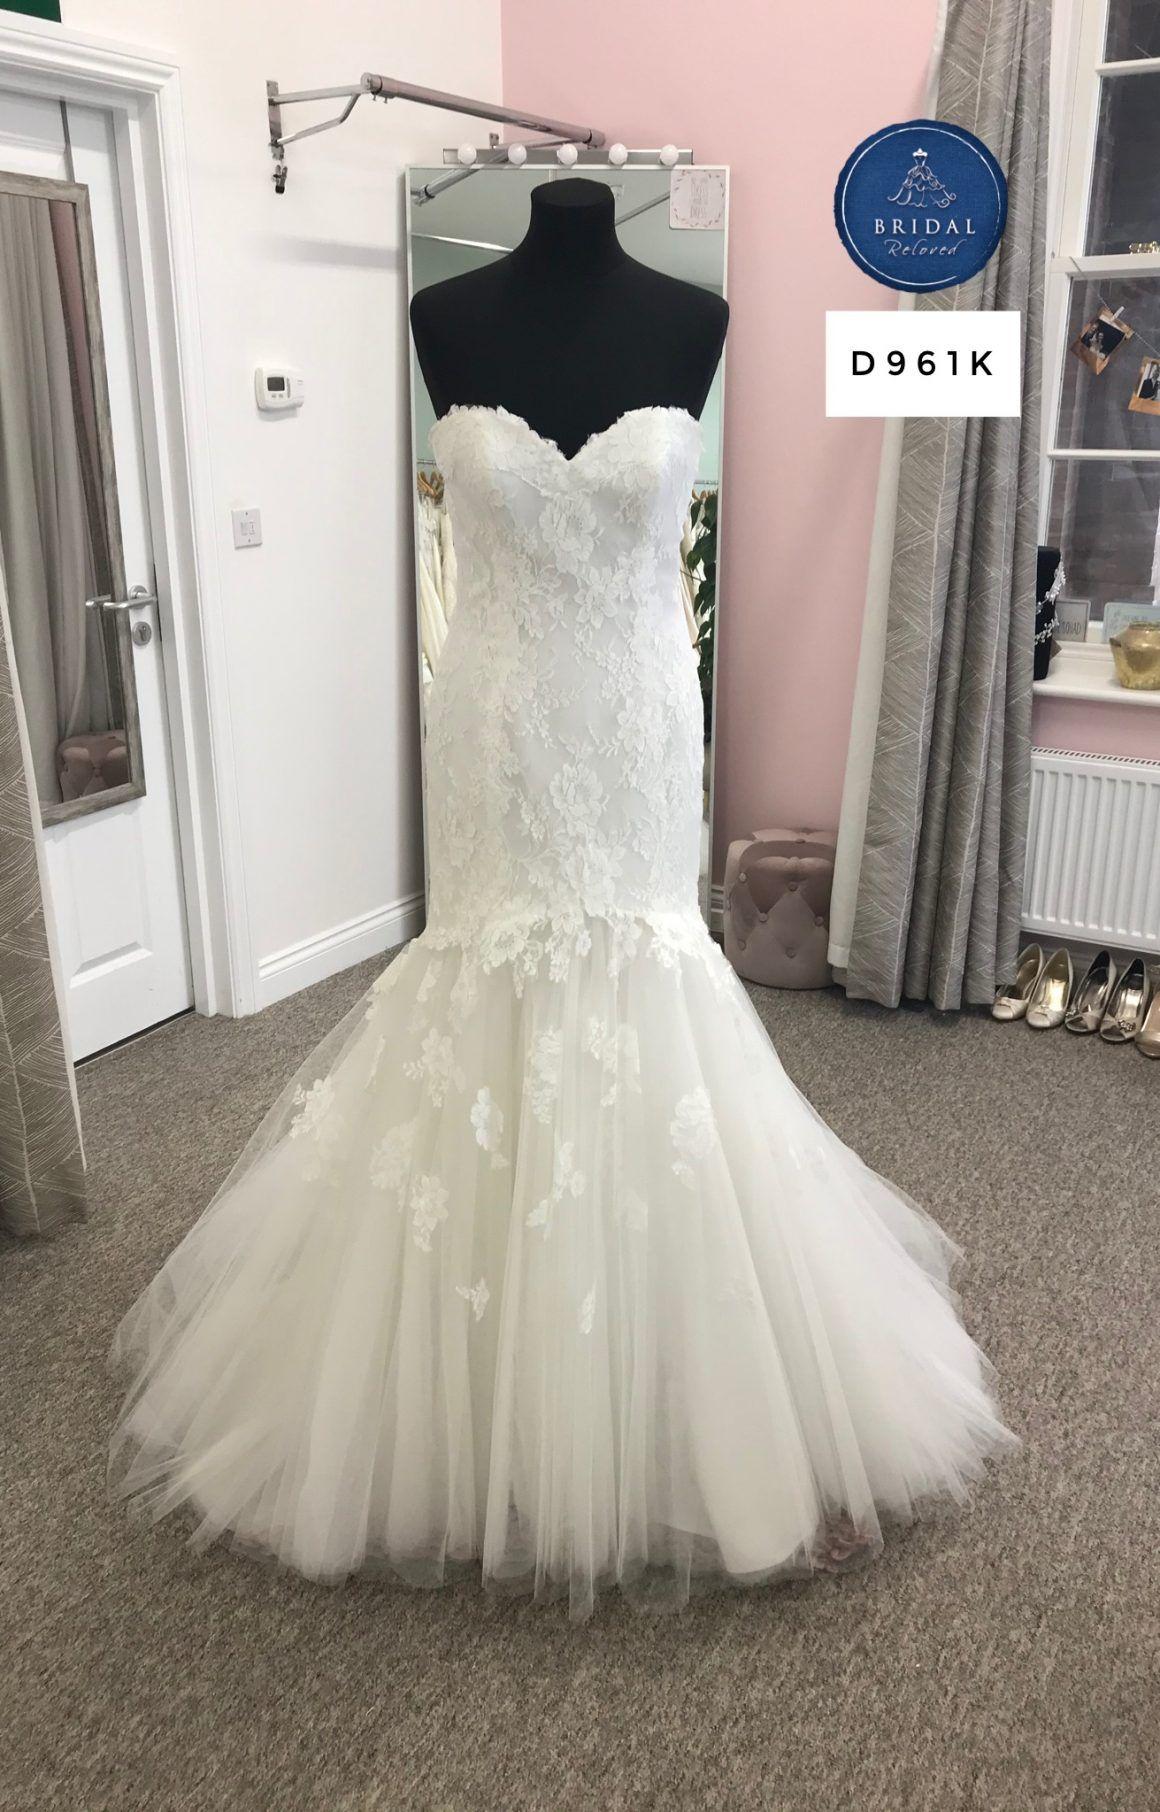 Cymbeline Wedding Dress Fishtail D961K Bridal